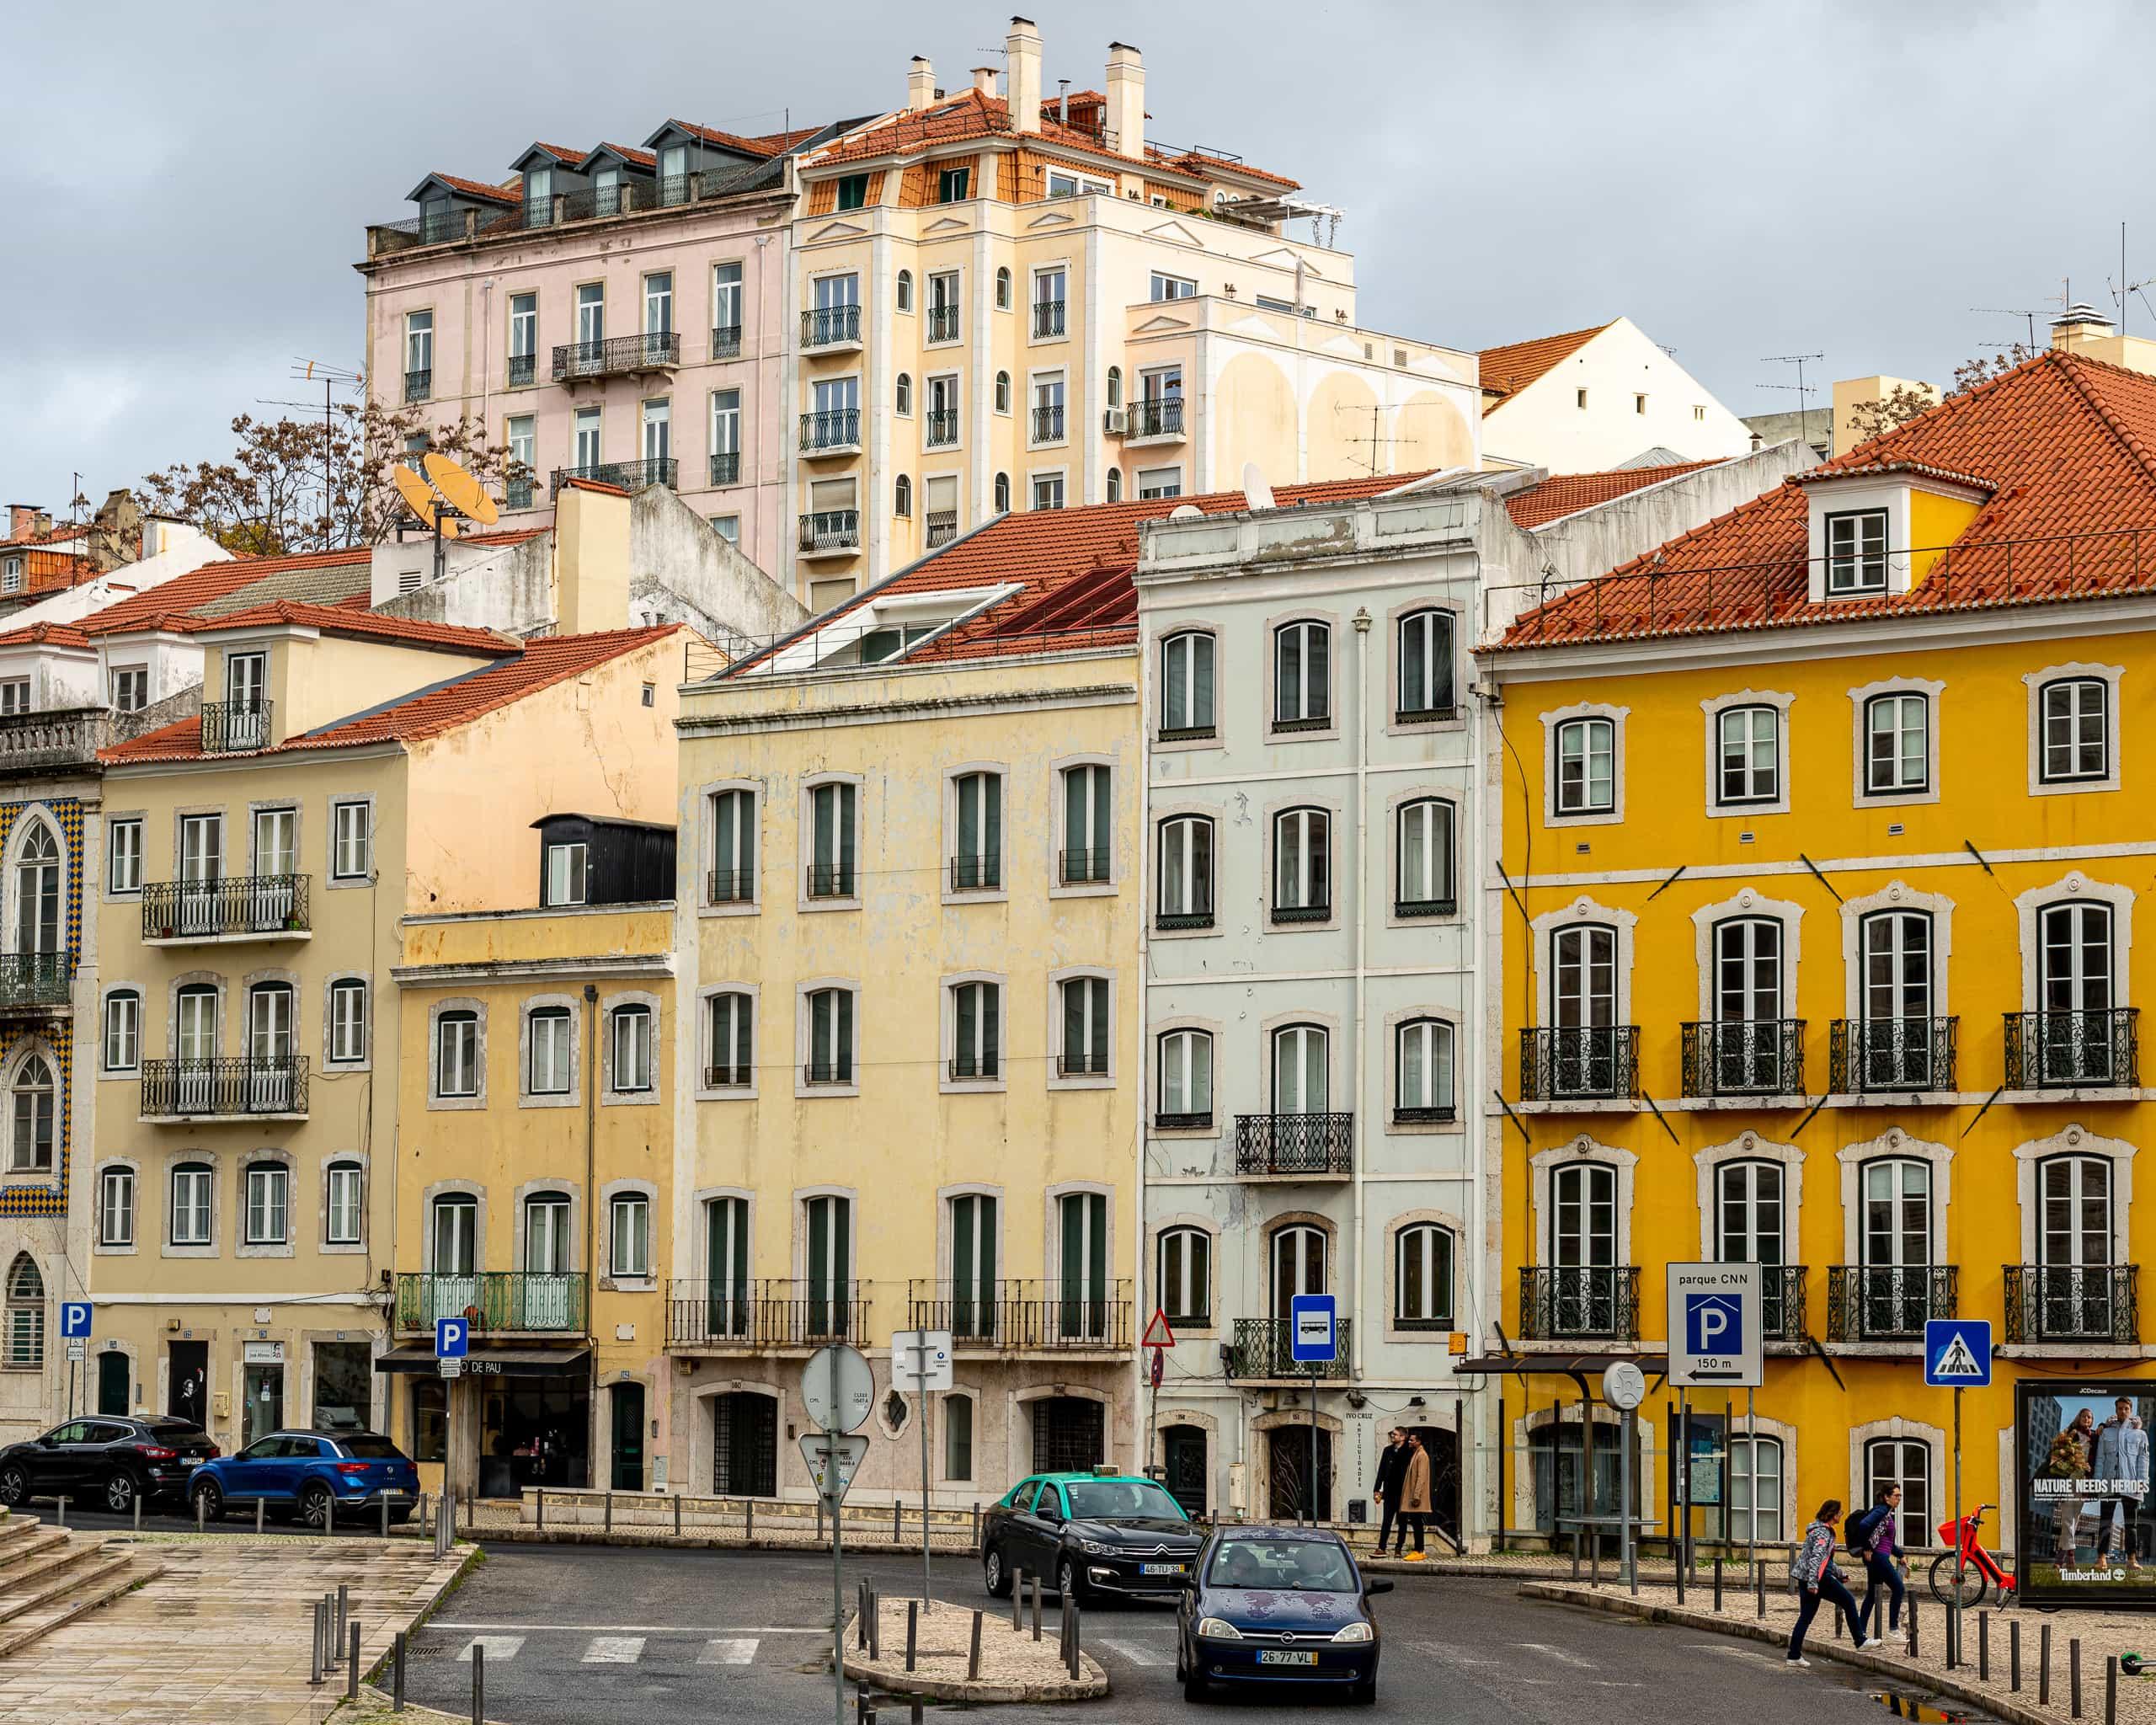 Streets of Lisbon #1